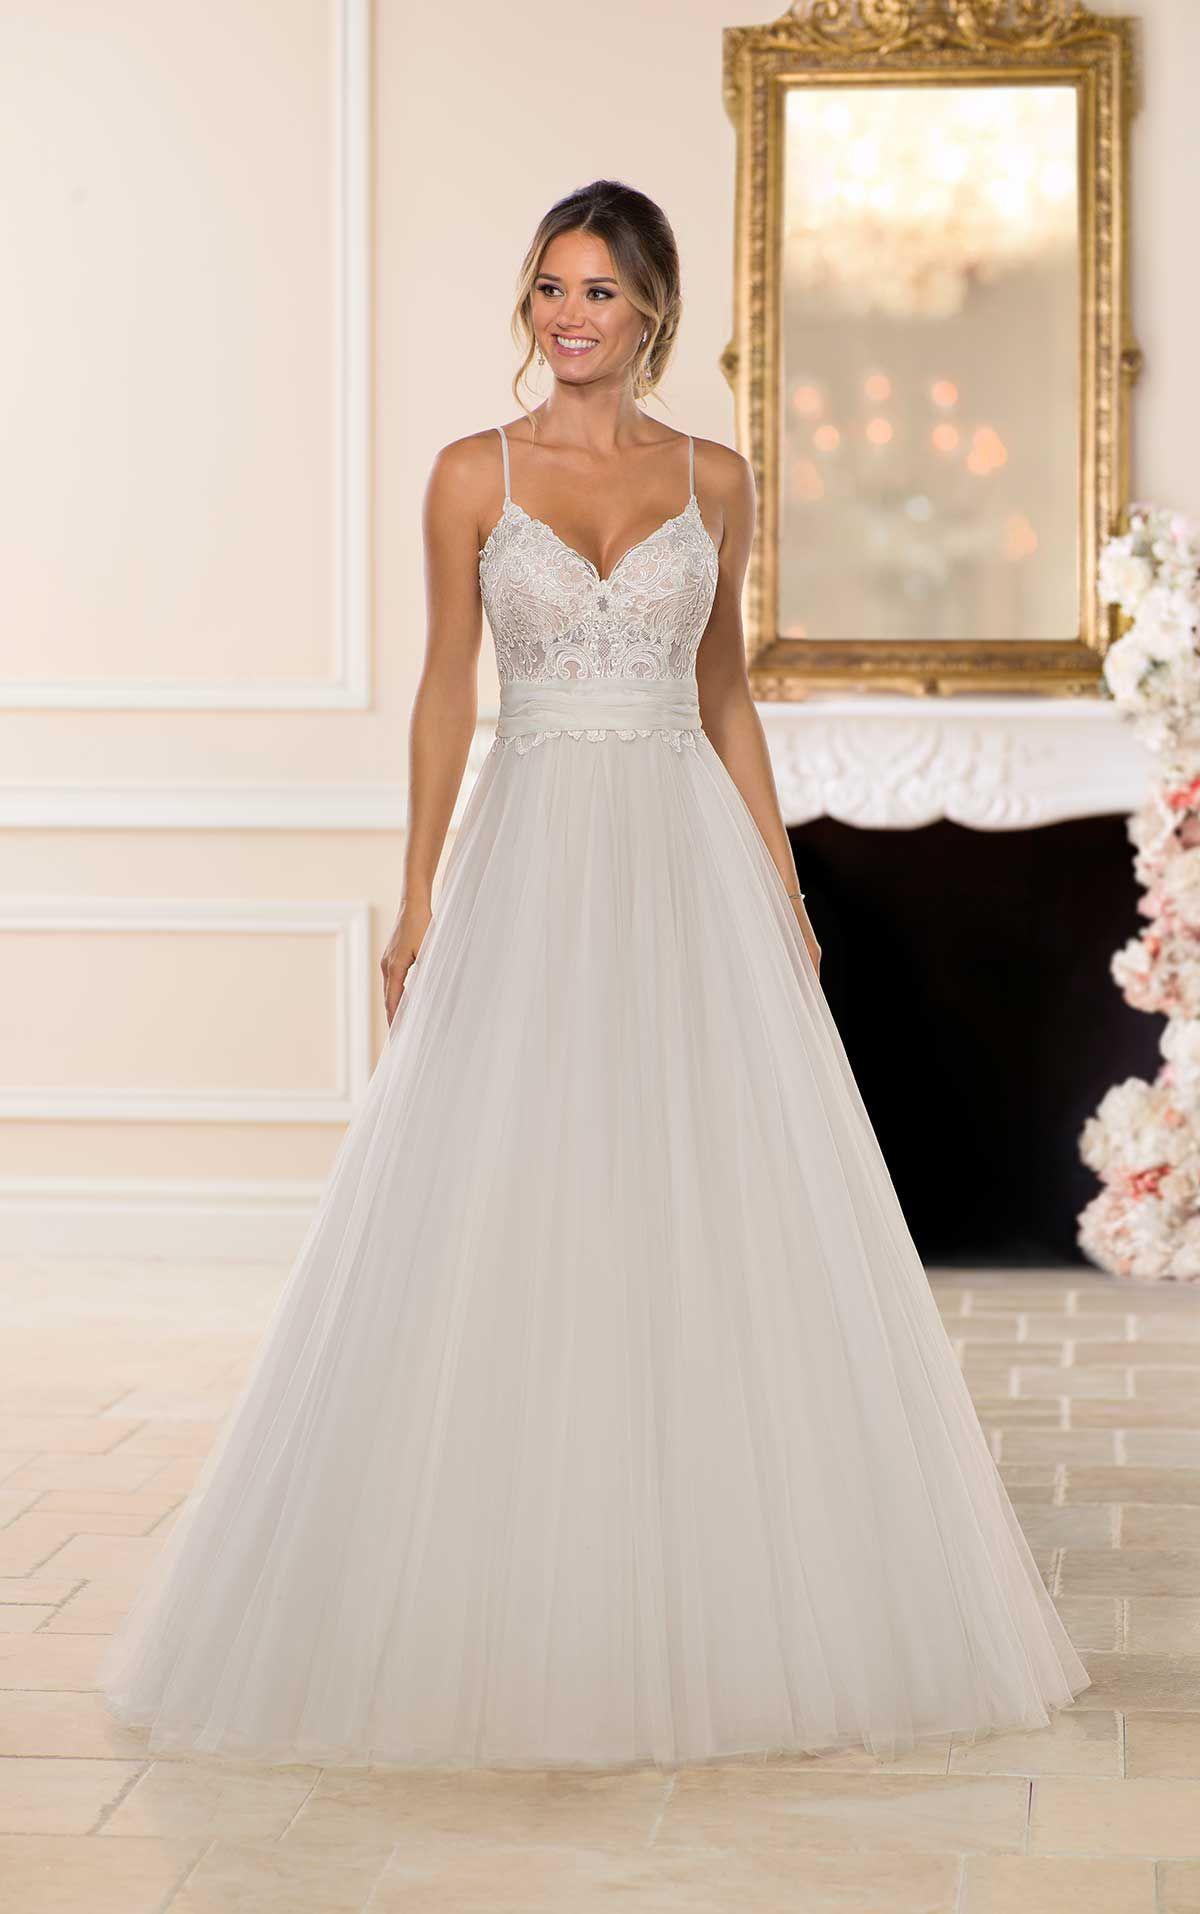 Romantic boho ballgown wedding dress wedding day uc pinterest